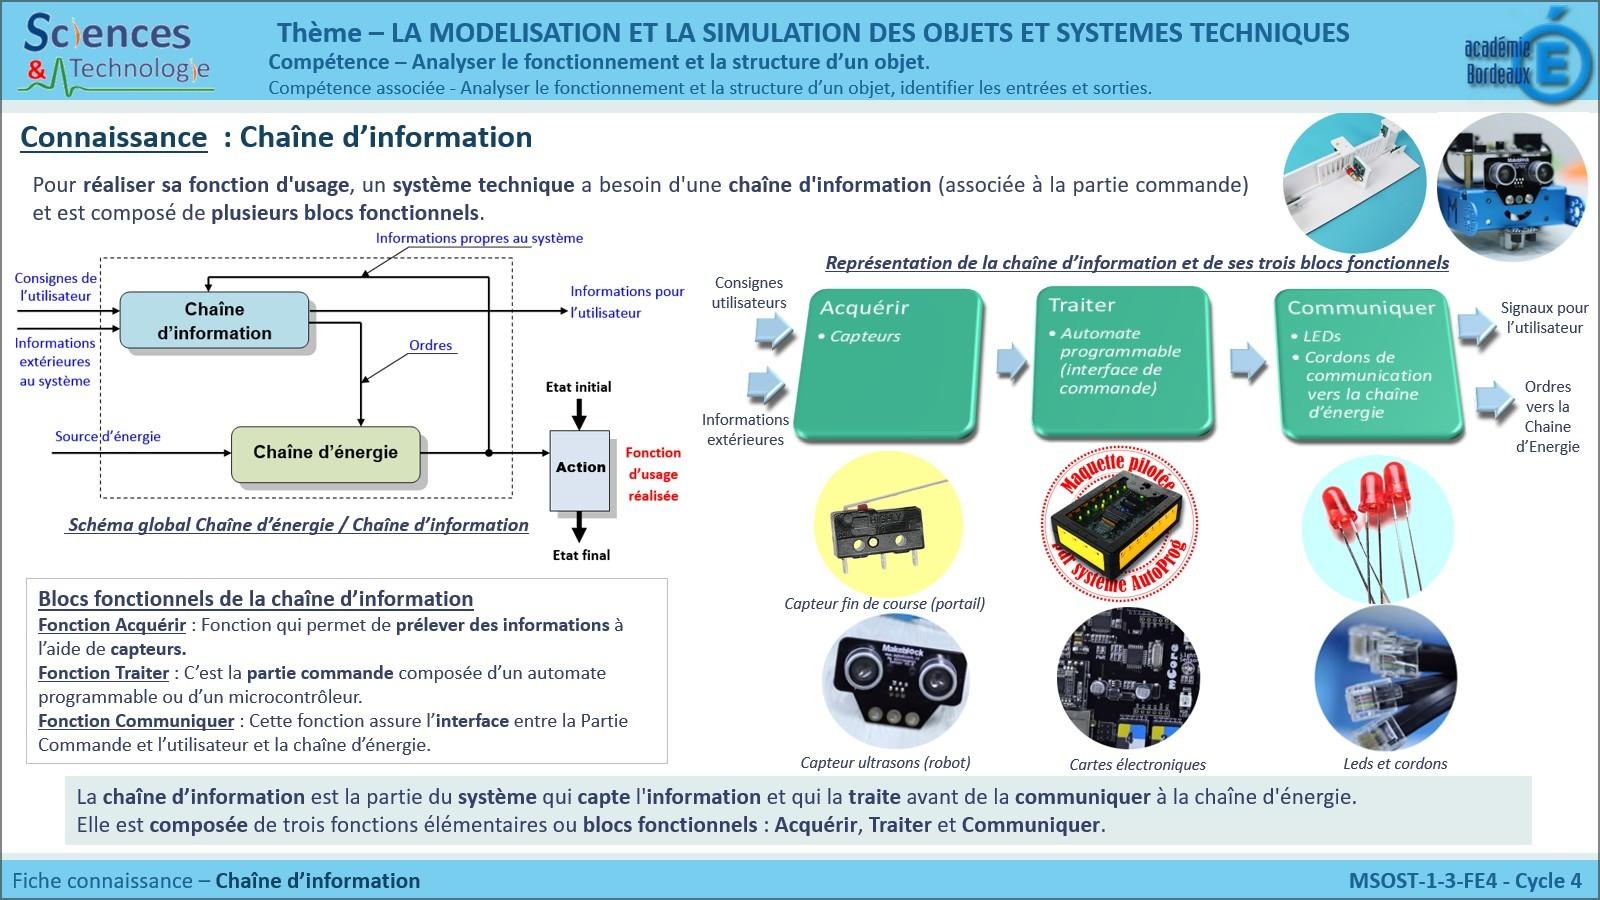 Msost 1 3 fe4 cha ne d information sti for Architecture informatique definition